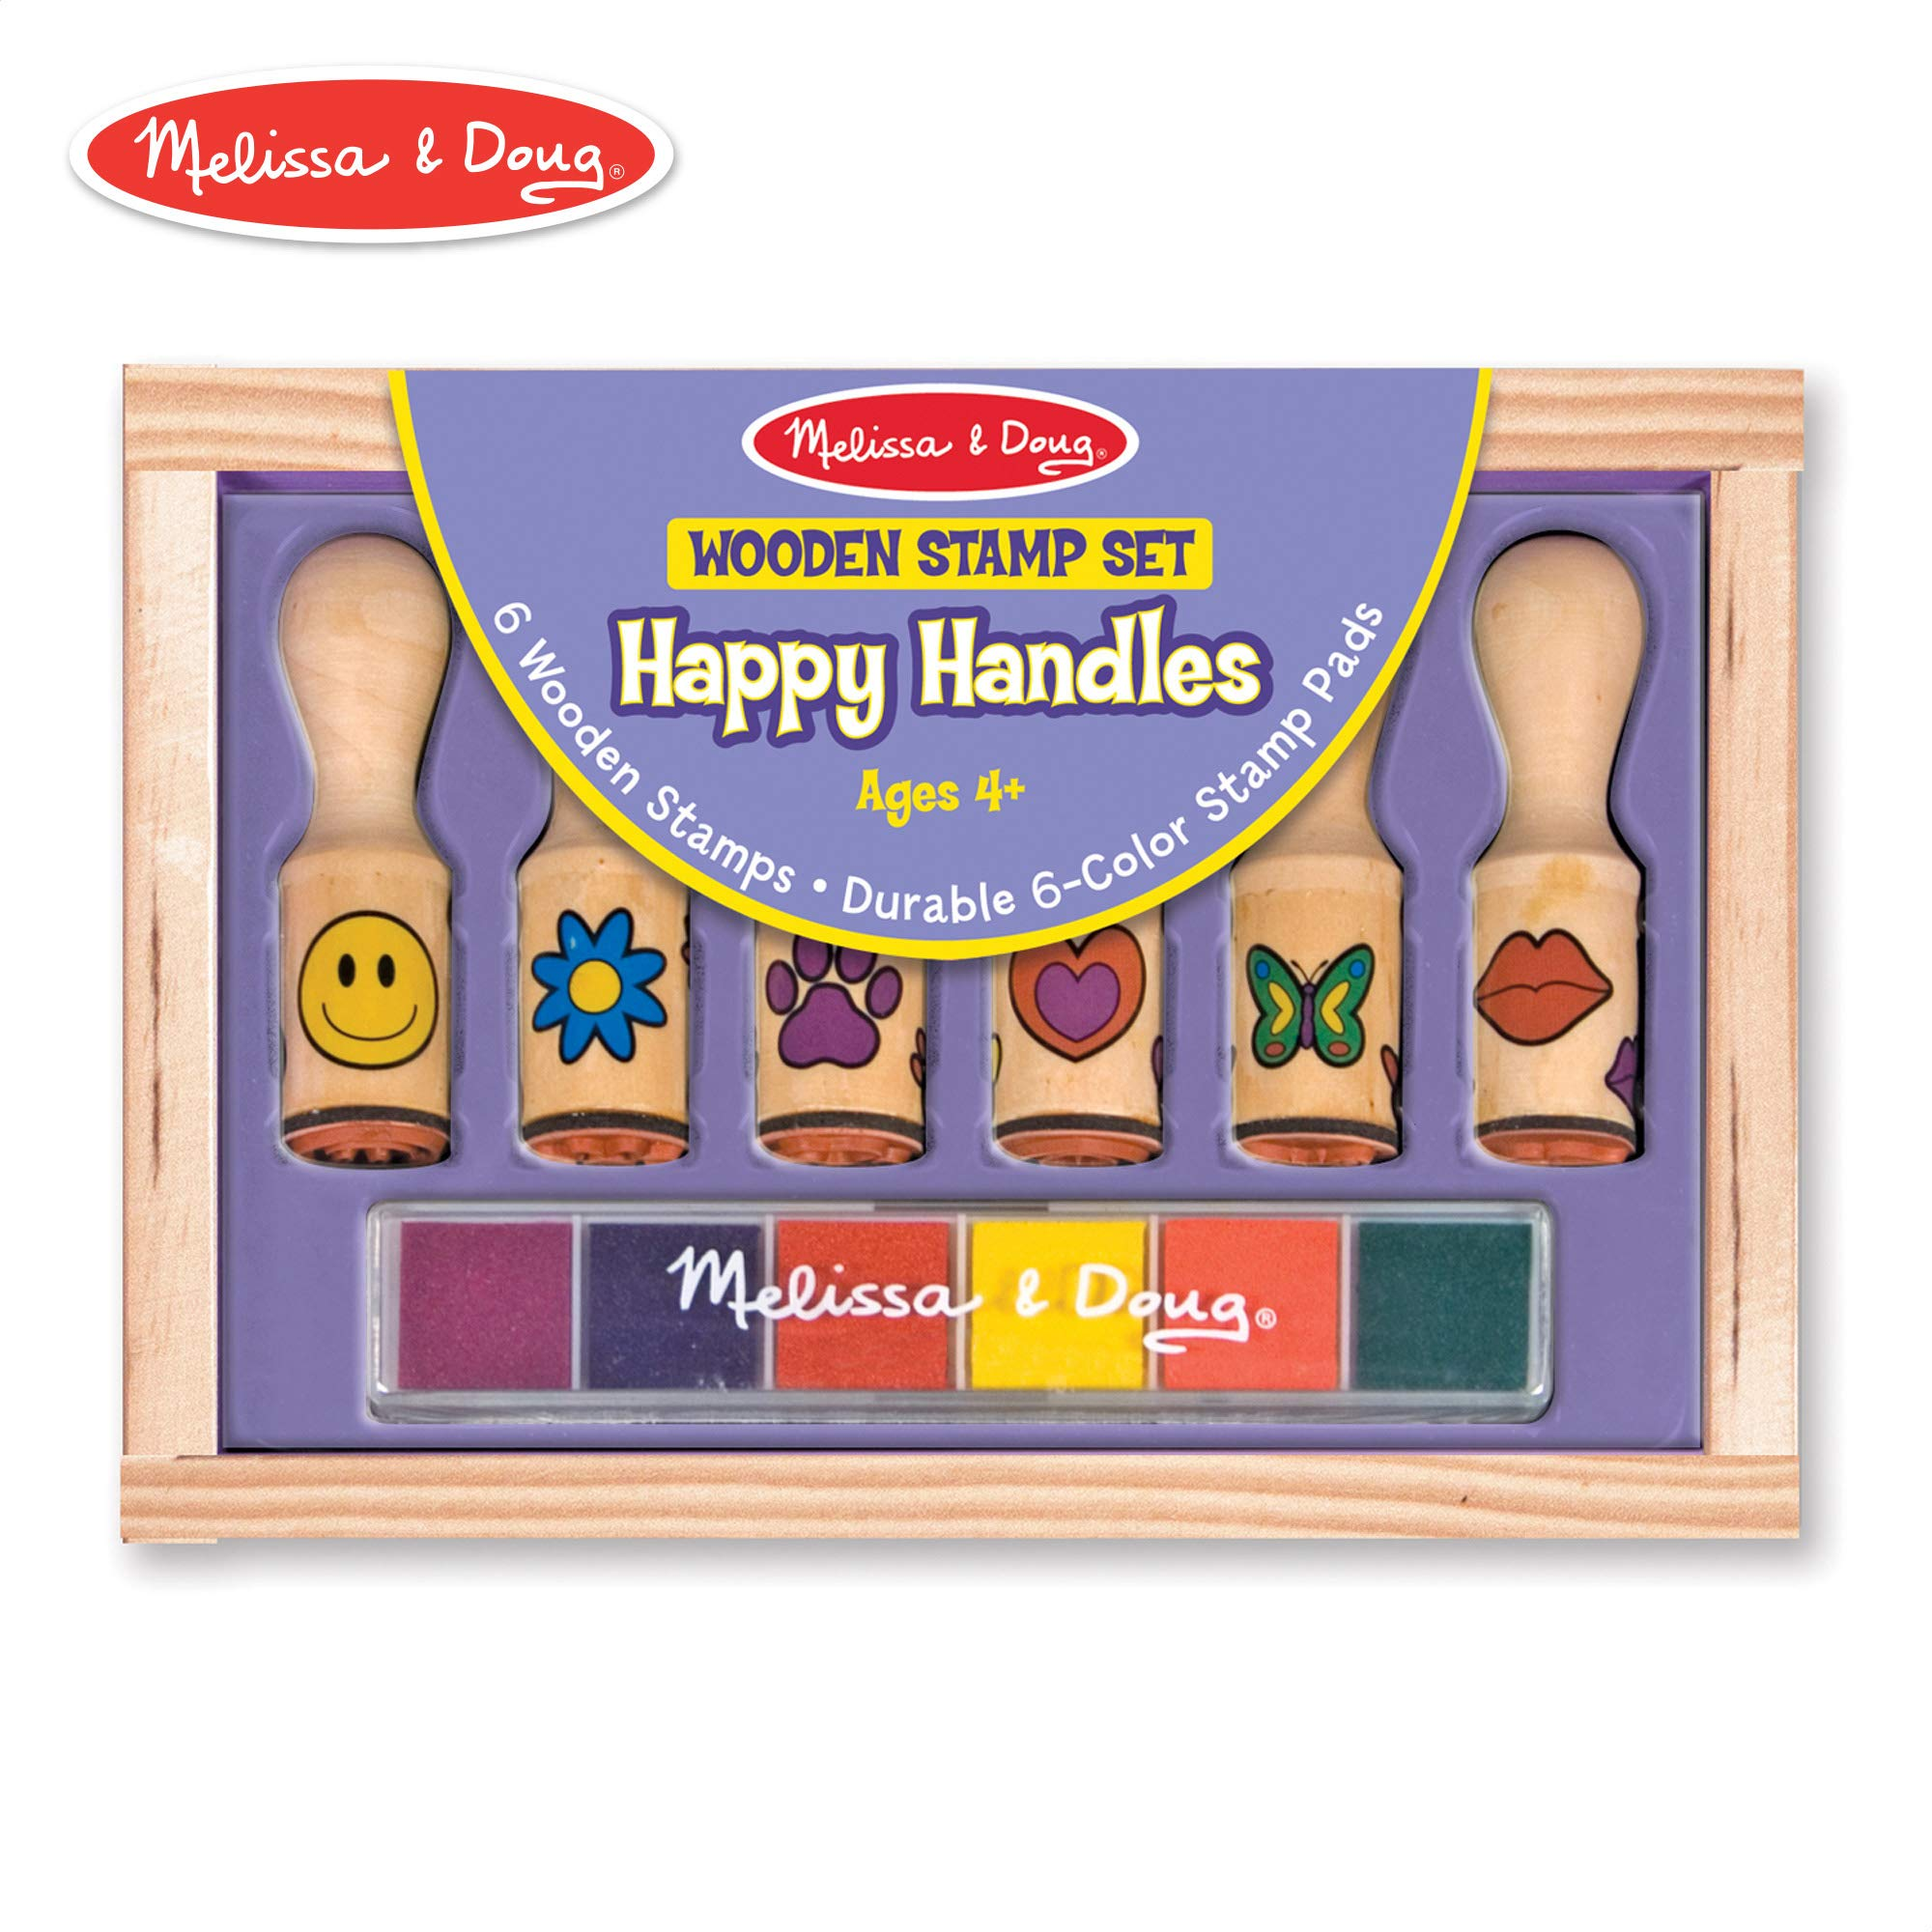 Melissa /& Doug Wooden Stamp Set Disney Princesses Arts /& Crafts, Sturdy Wooden Storage Box, Washable Ink, 17 Pieces, 8.75 H x 8 W x 1.5 L